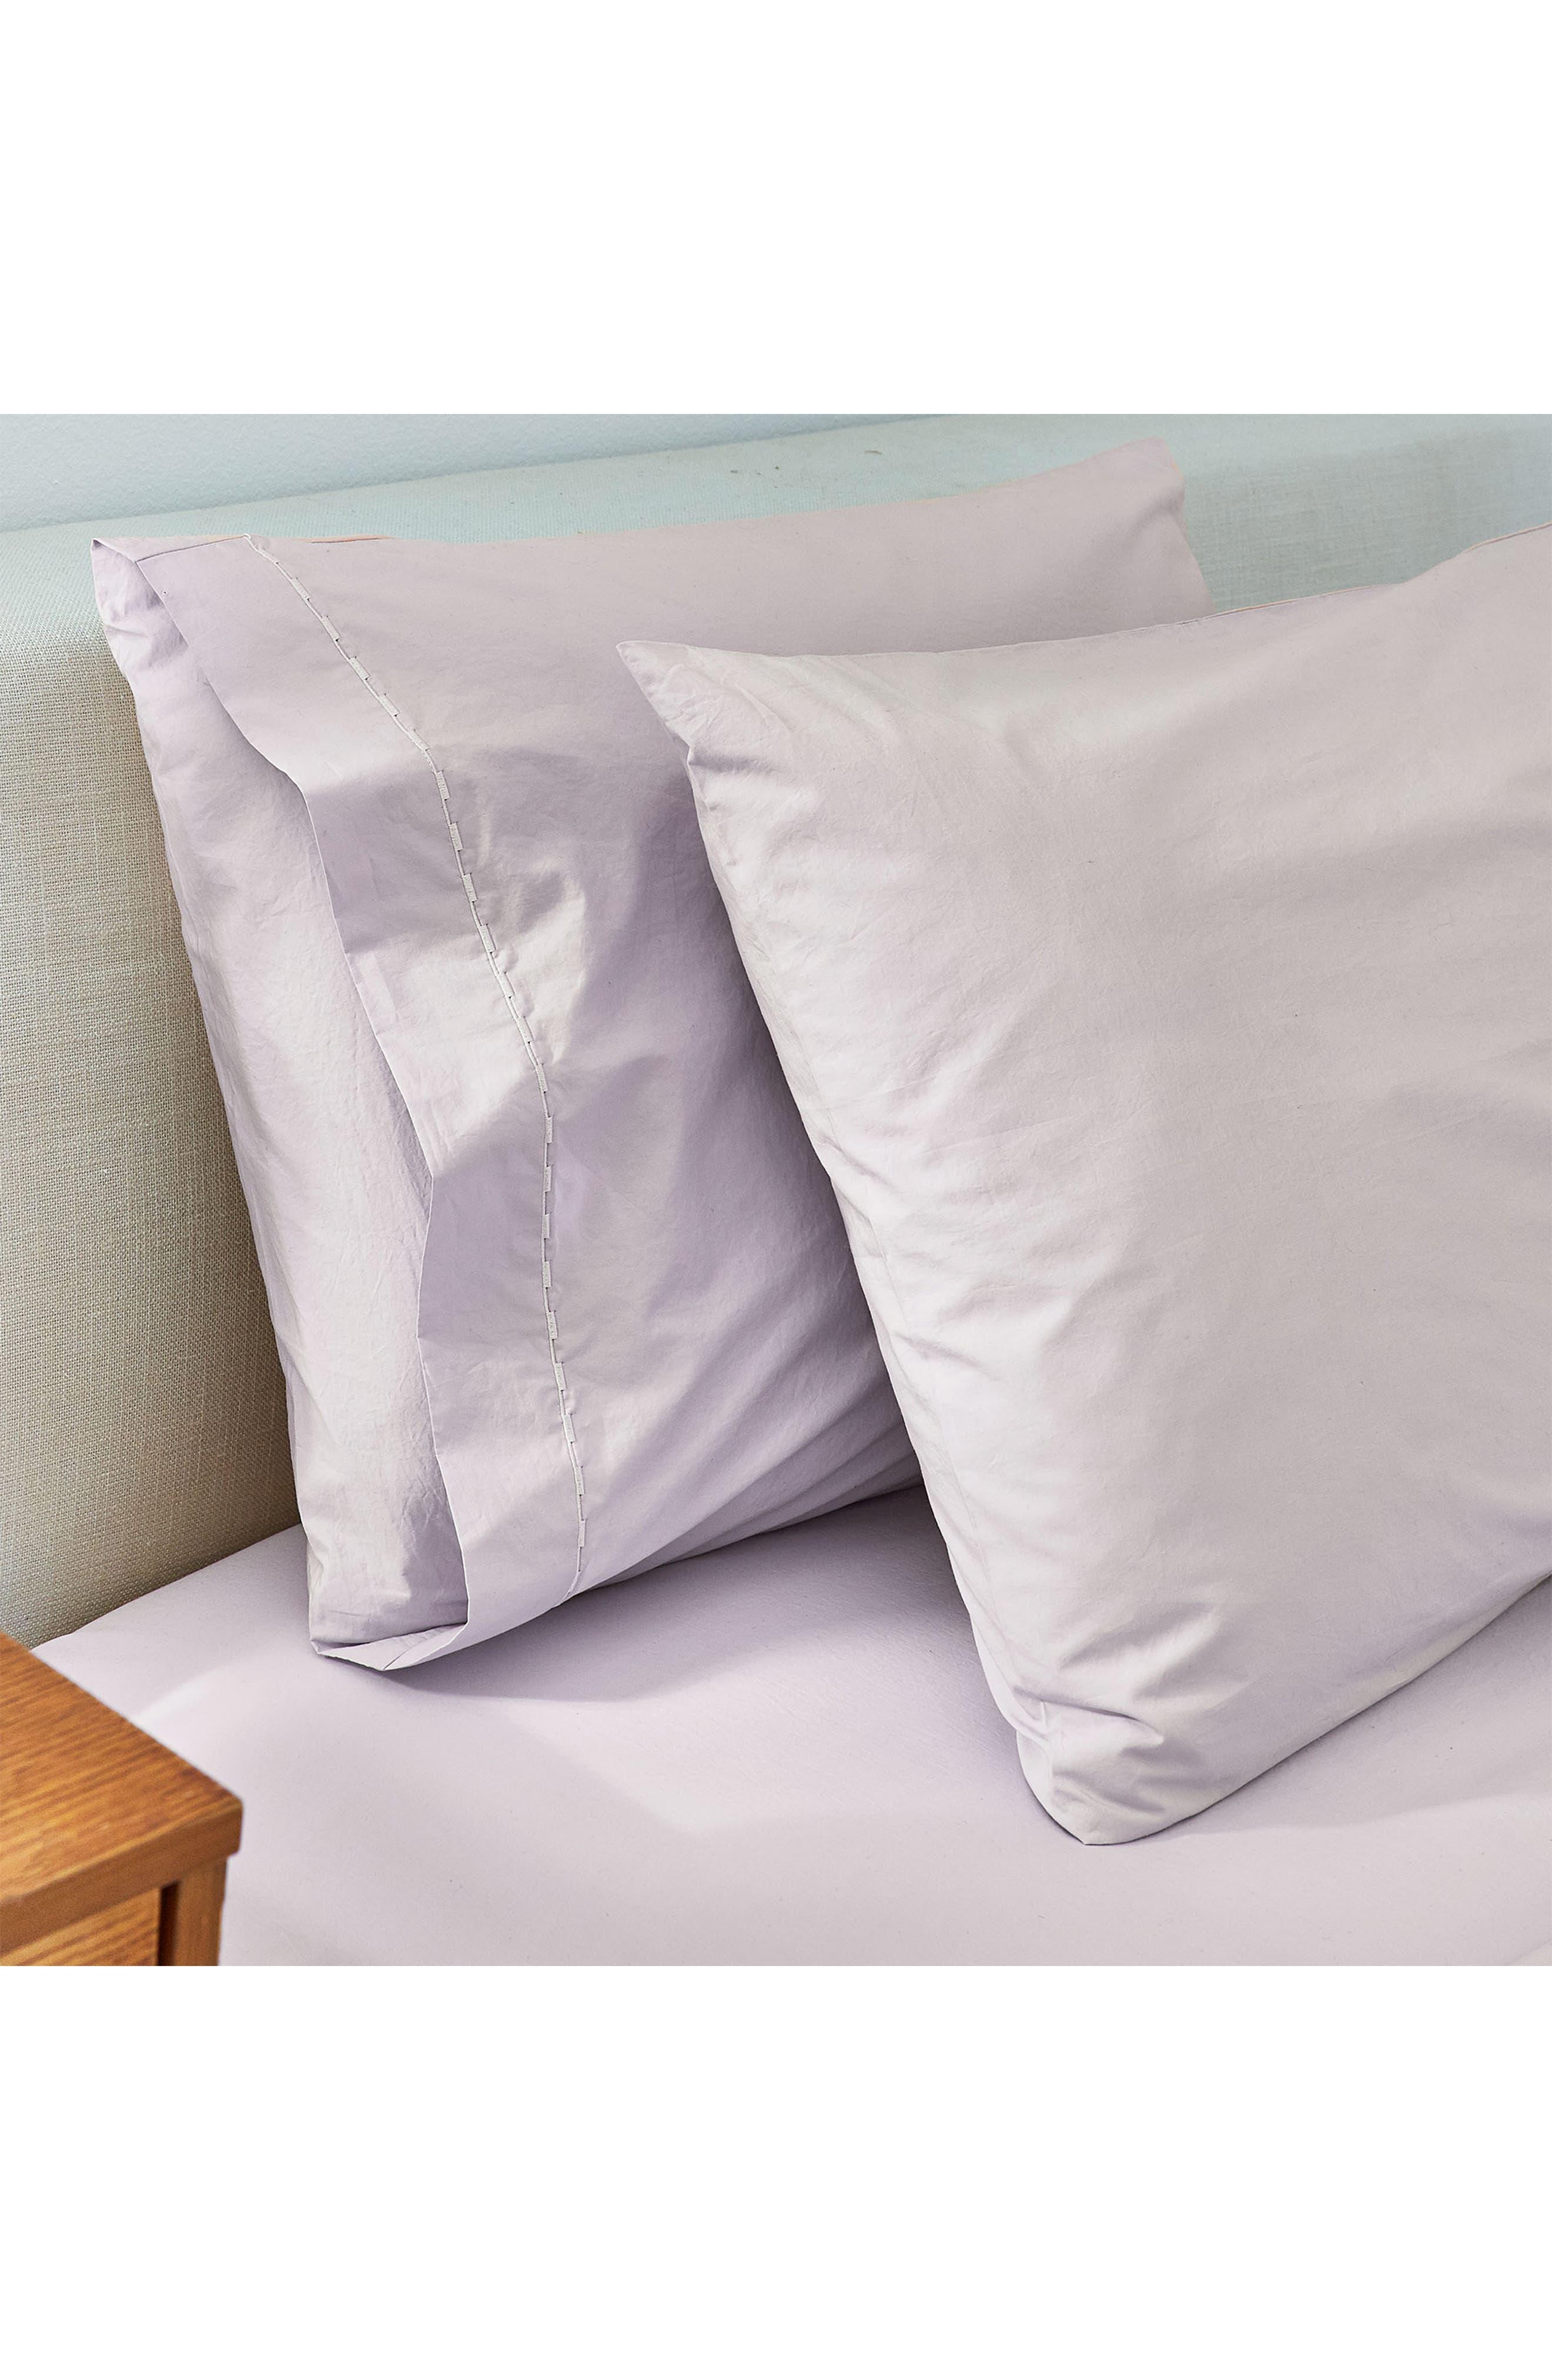 SPLENDID HOME DECOR Spendid Home Decor Cotton Percale Pillowcases, Main, color, 027